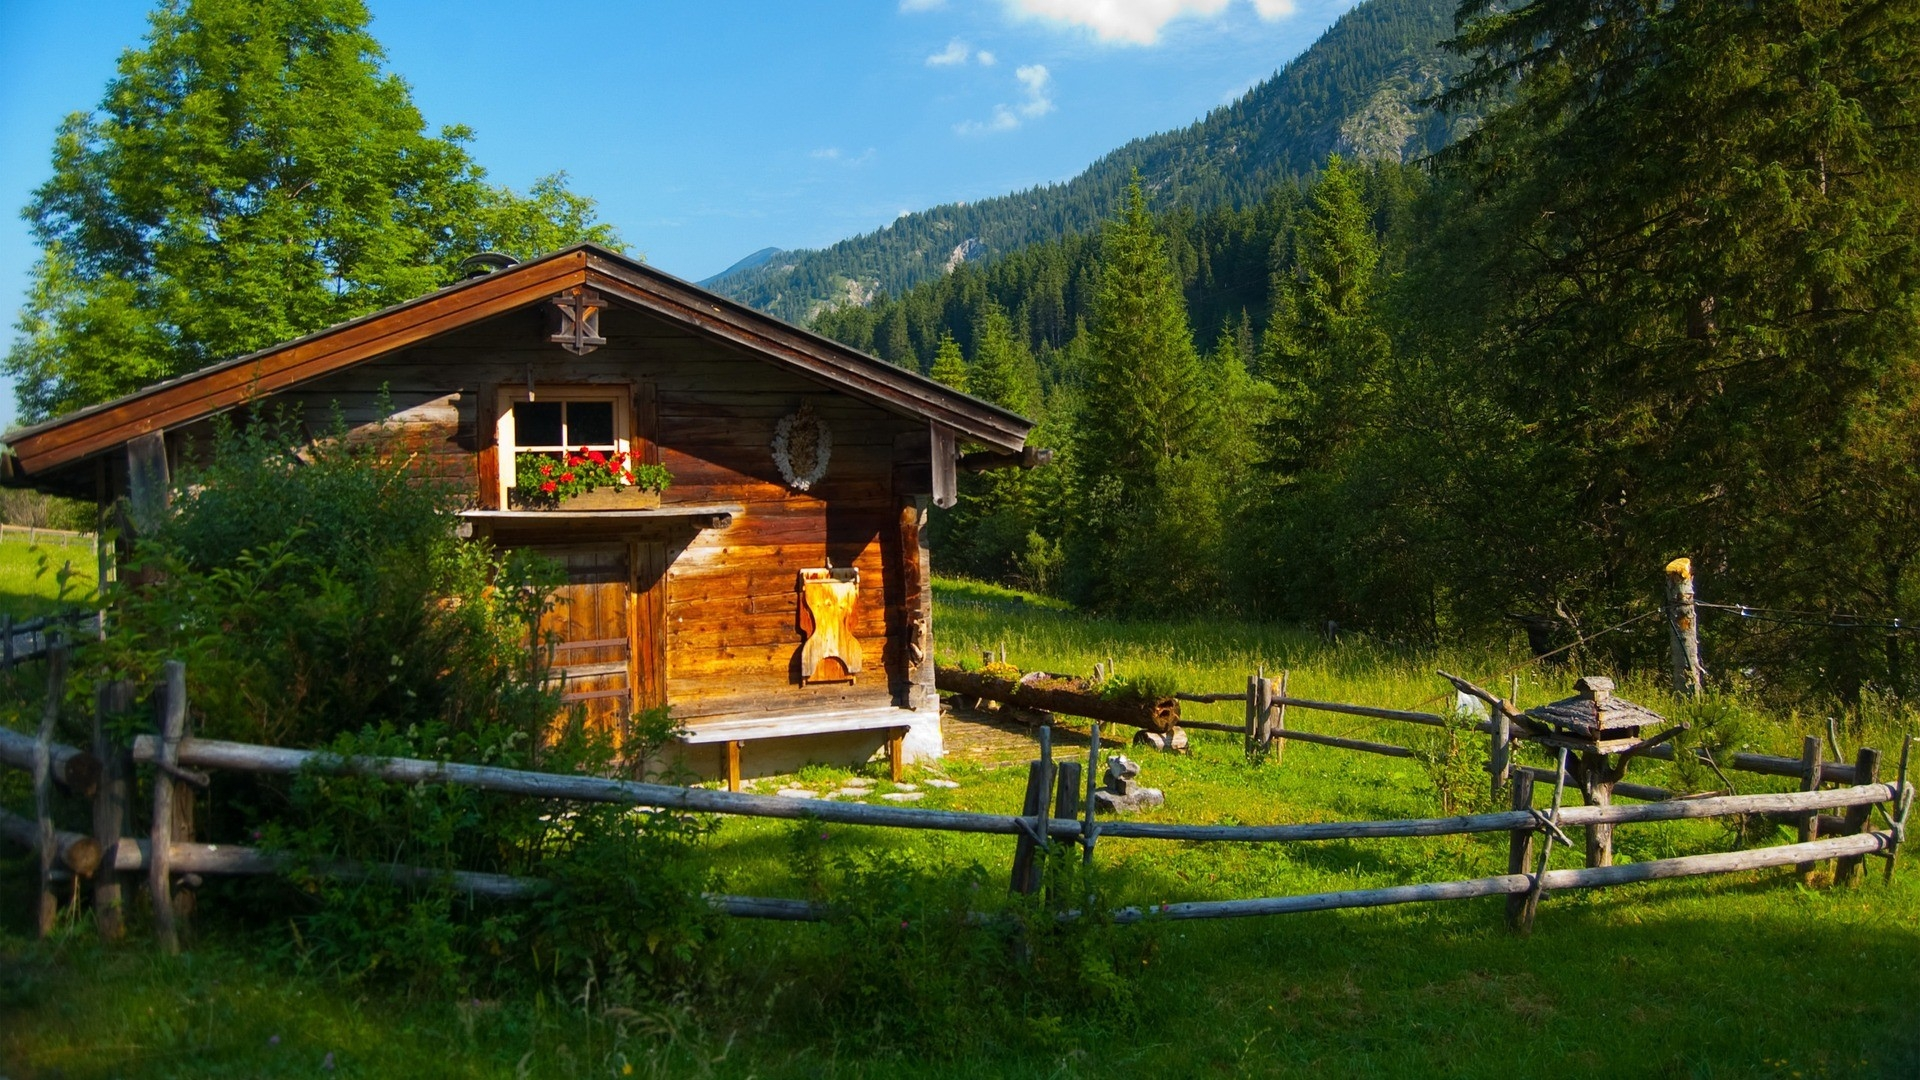 46 Free Mountain Cabin Wallpaper On Wallpapersafari